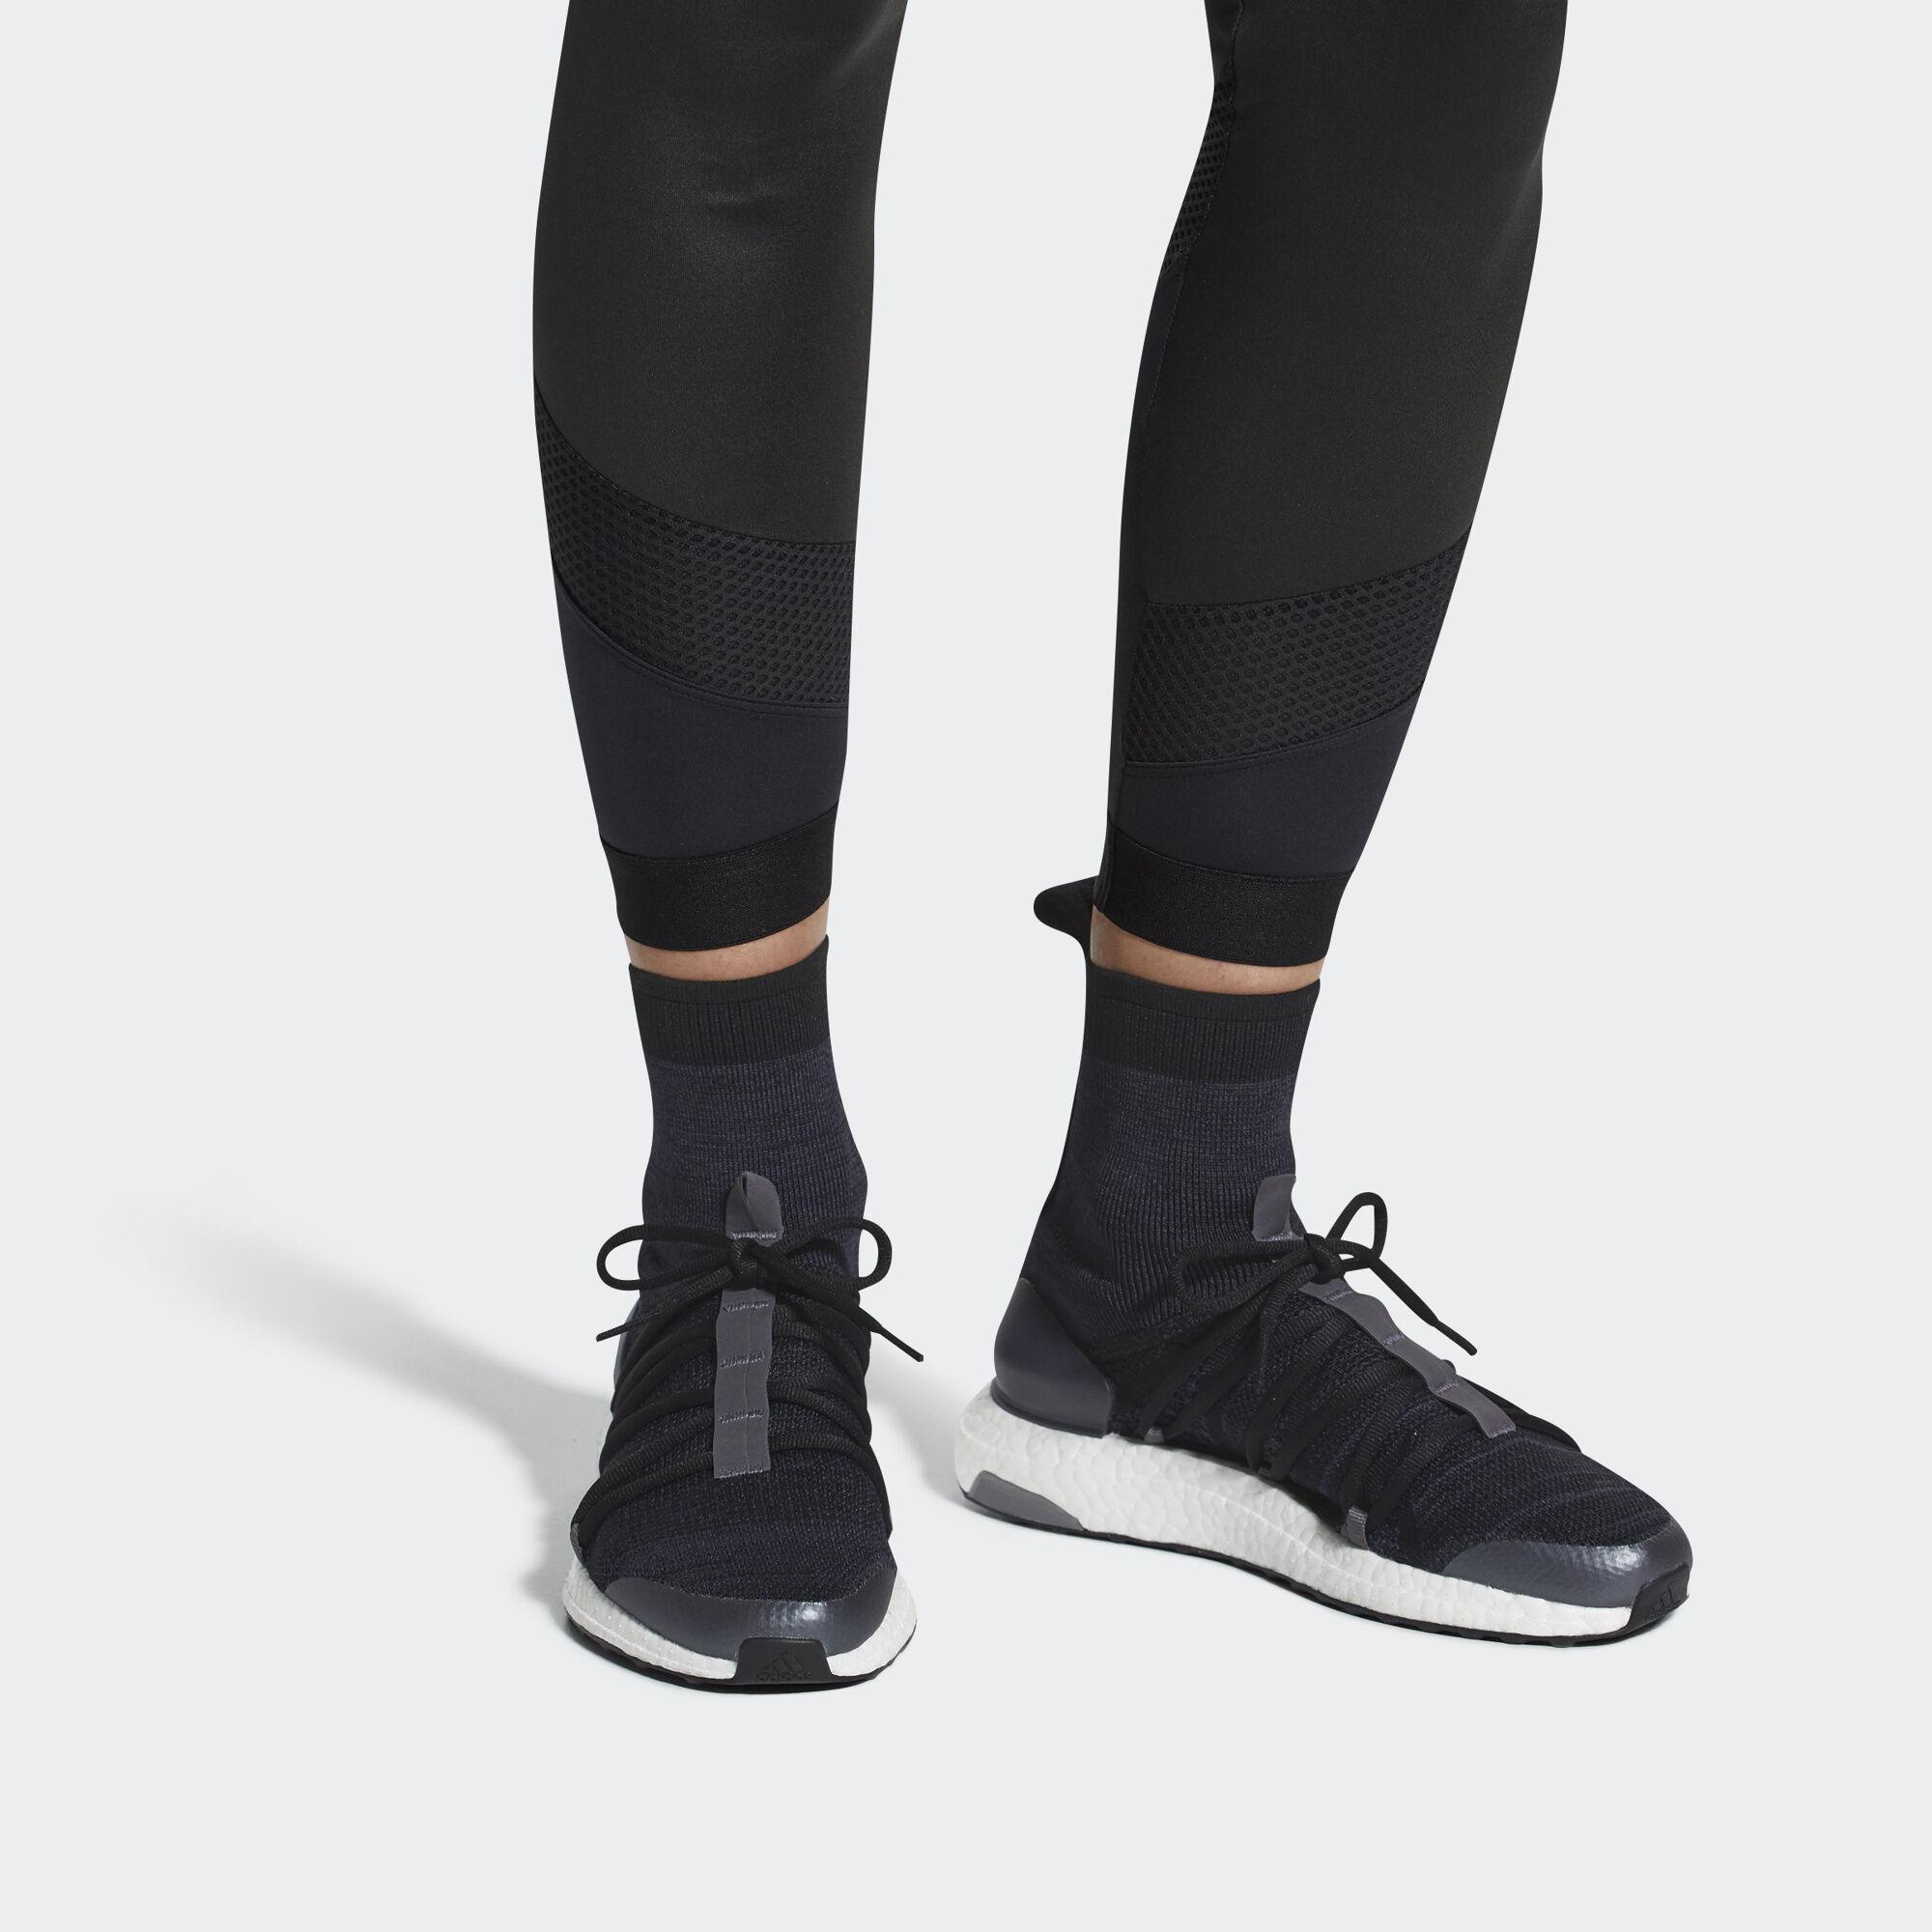 d274be6583fd adidas Ultraboost X Mid Shoes - Grey